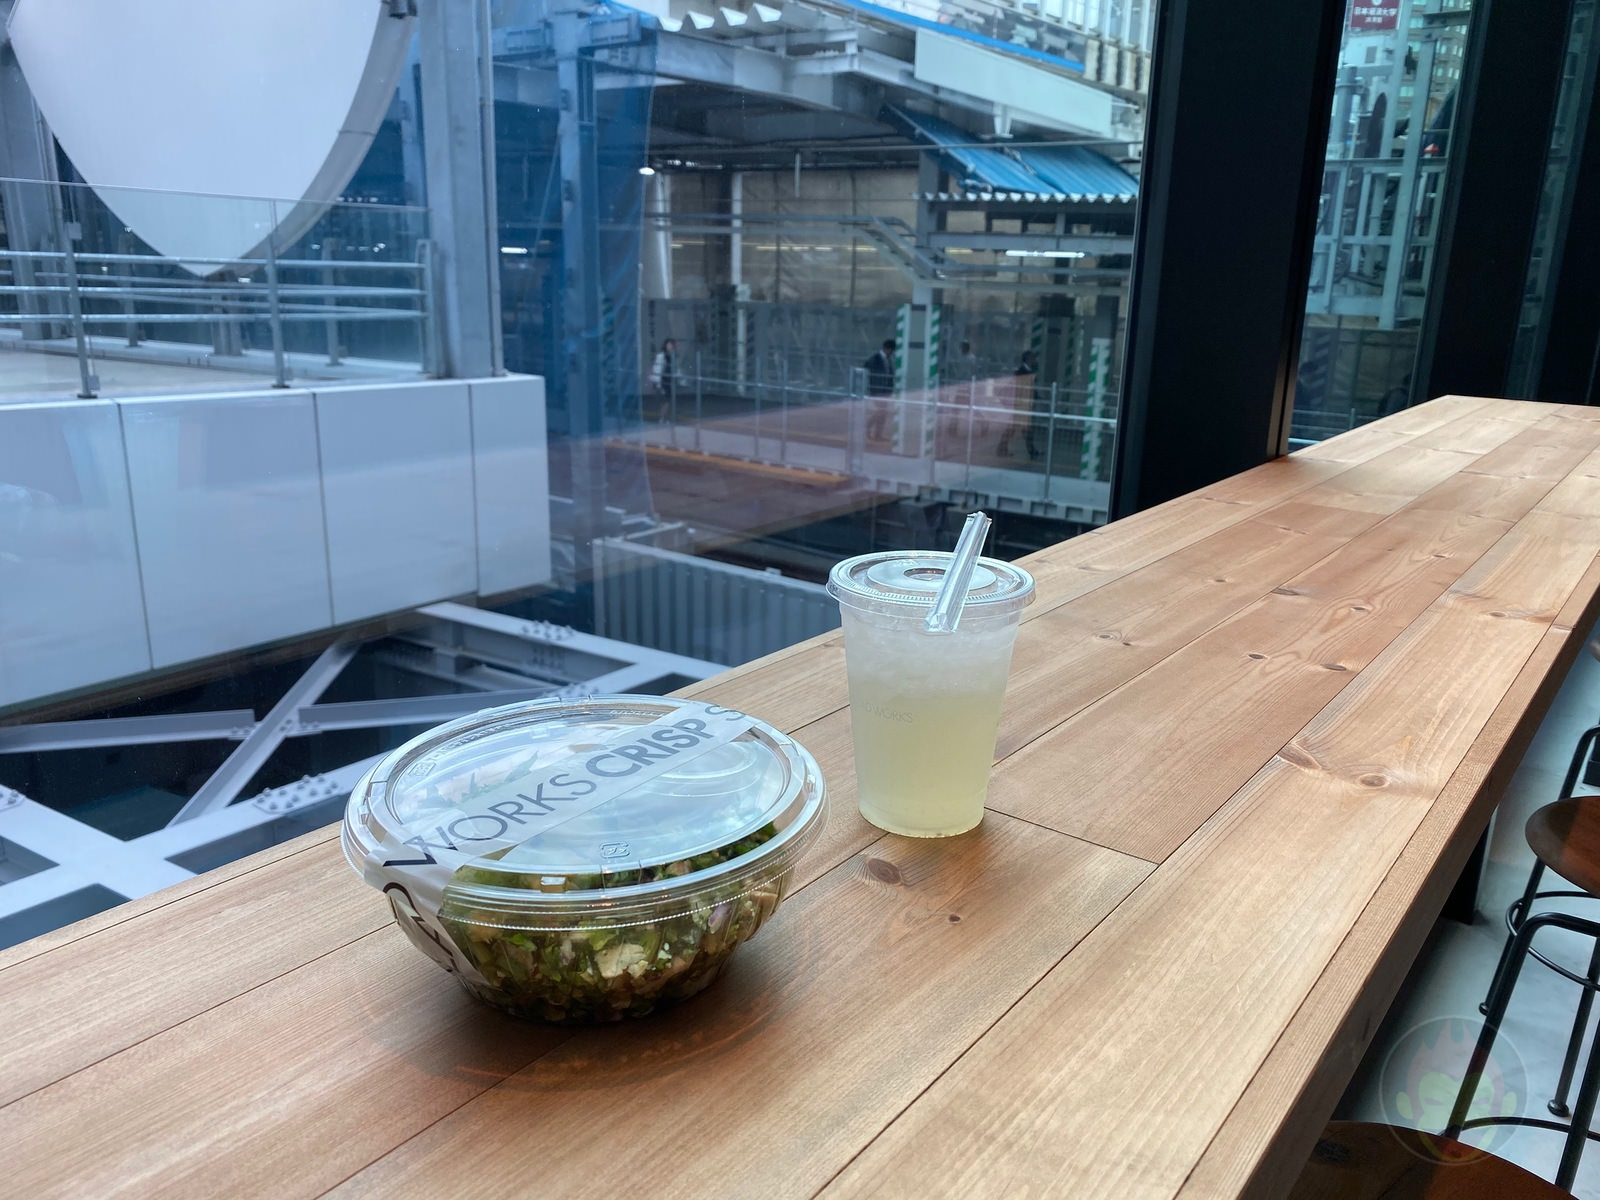 Crisp Salad Works Shibuya Scramble 06